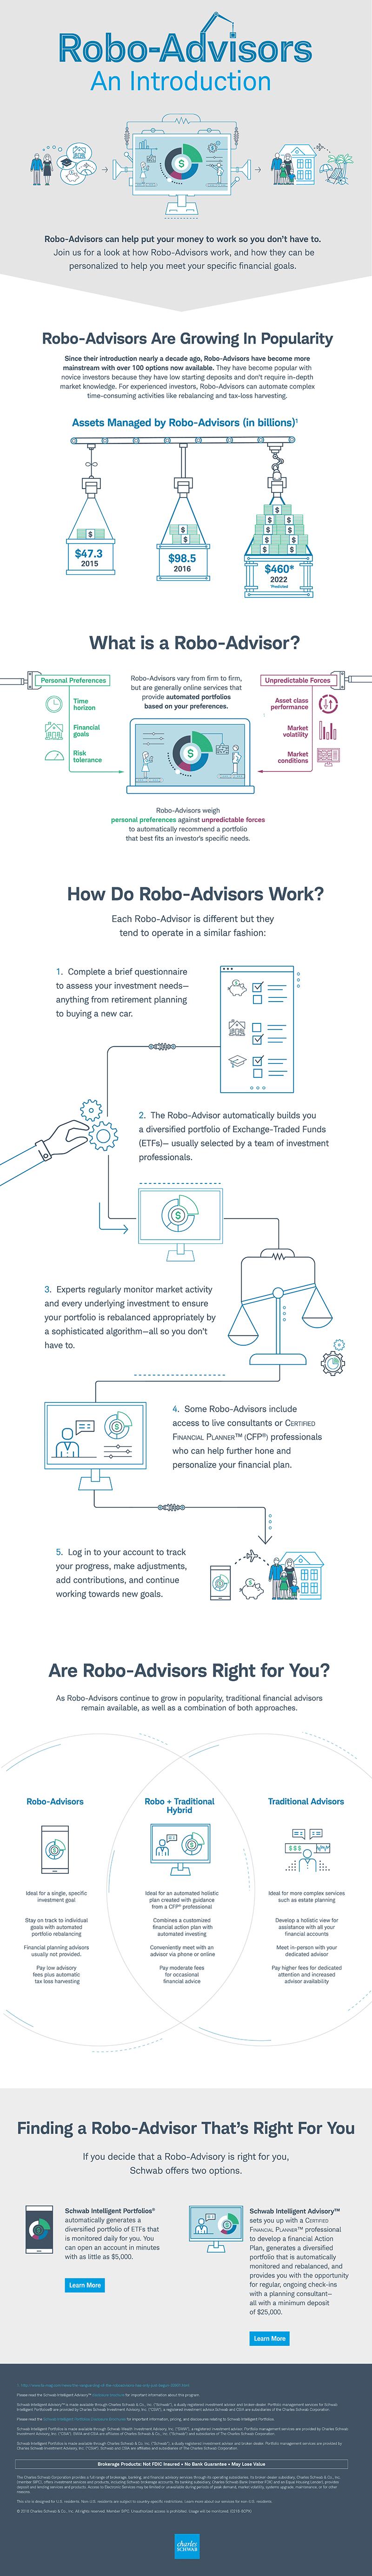 Schwab-robo-advisor-infographic